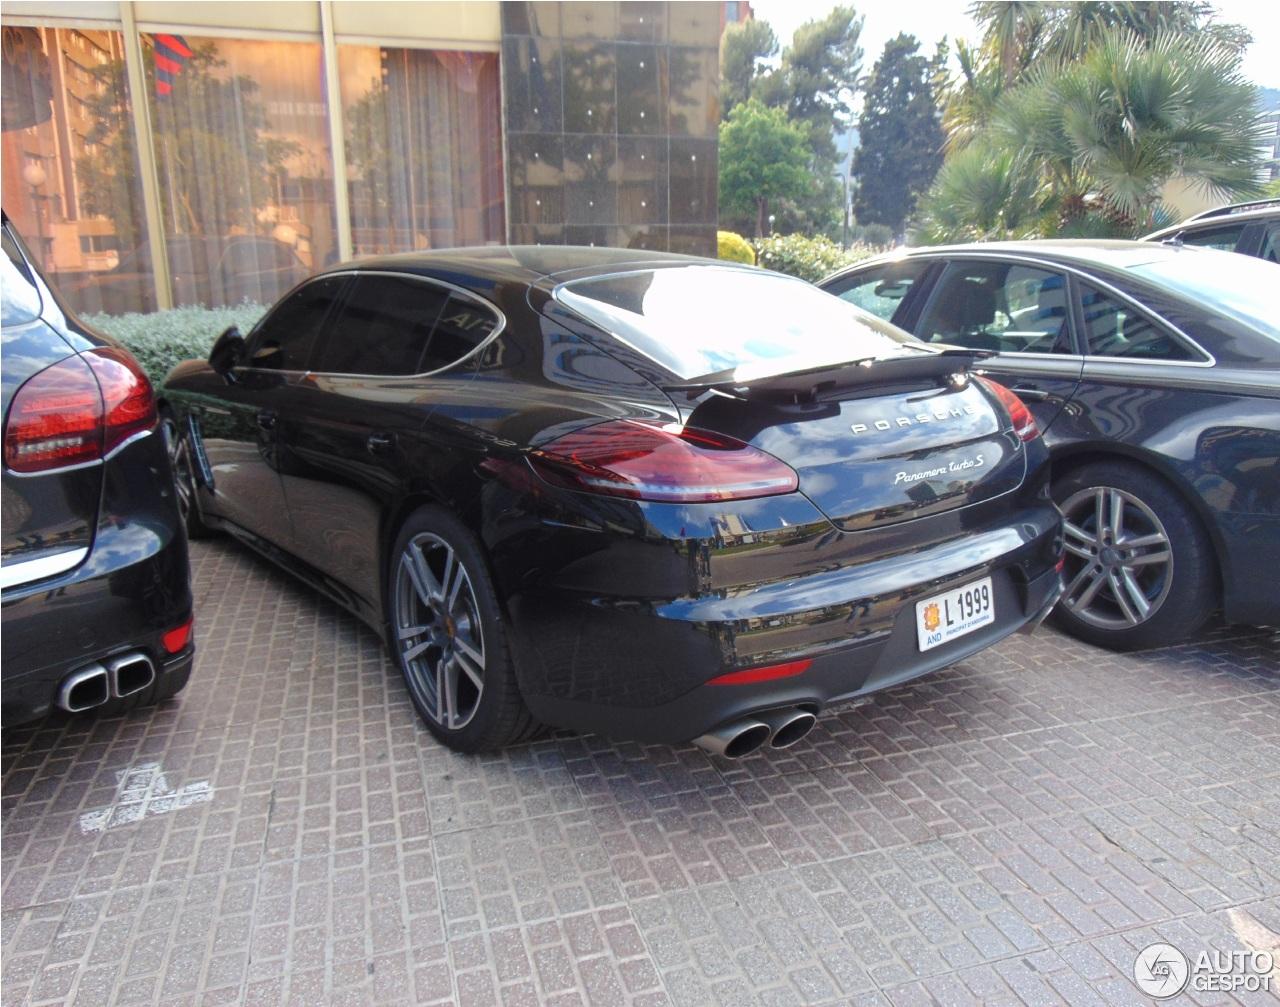 Porsche Panamera Turbo S Executive Mkii 8 June 2014